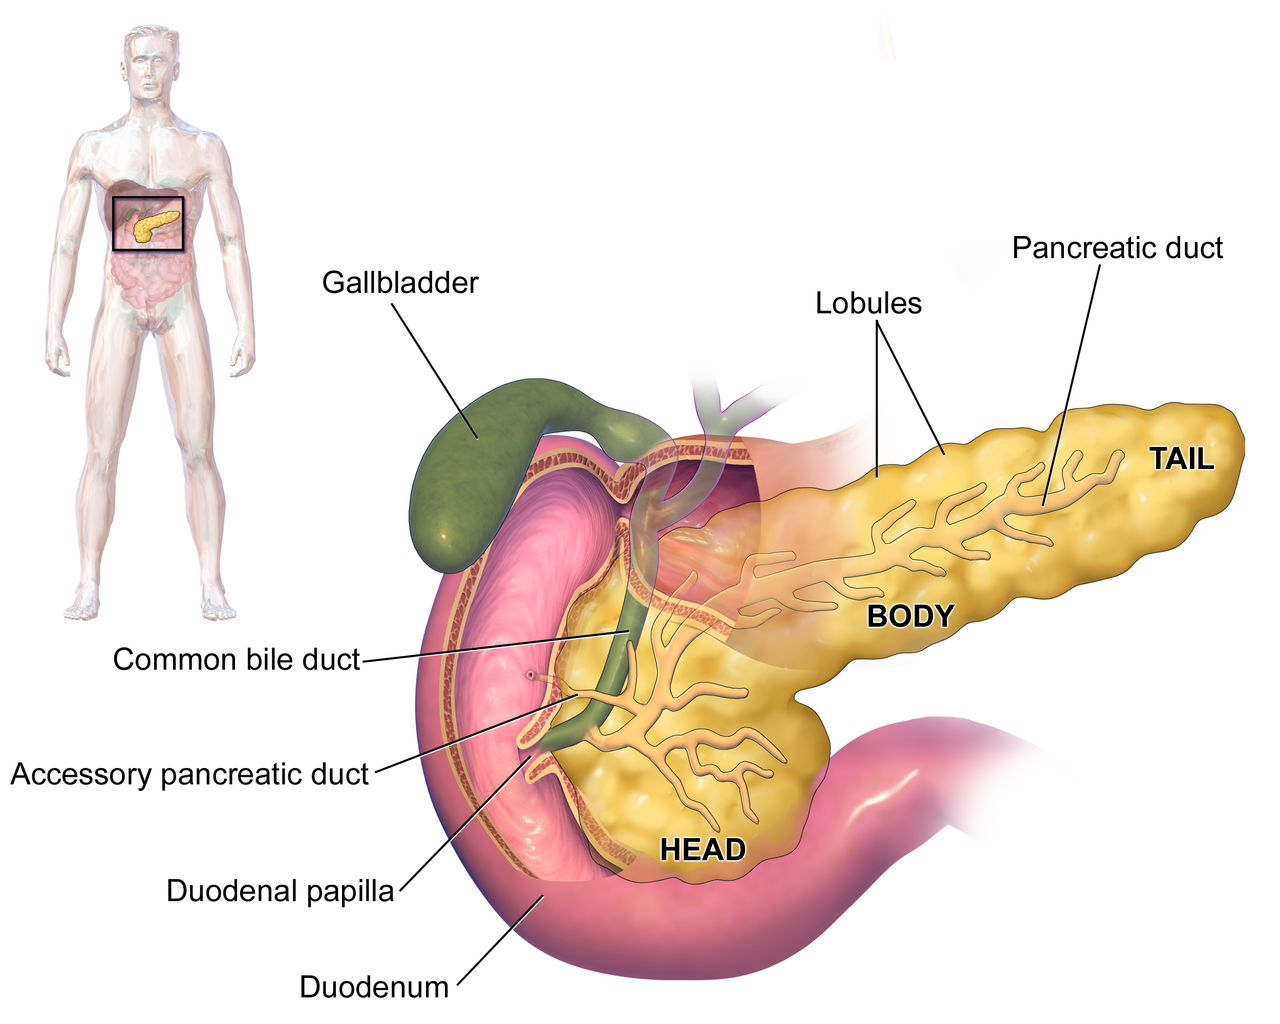 Blausen_0699_PancreasAnatomy2 By Bruce Blaus Own work CC BY 3_0